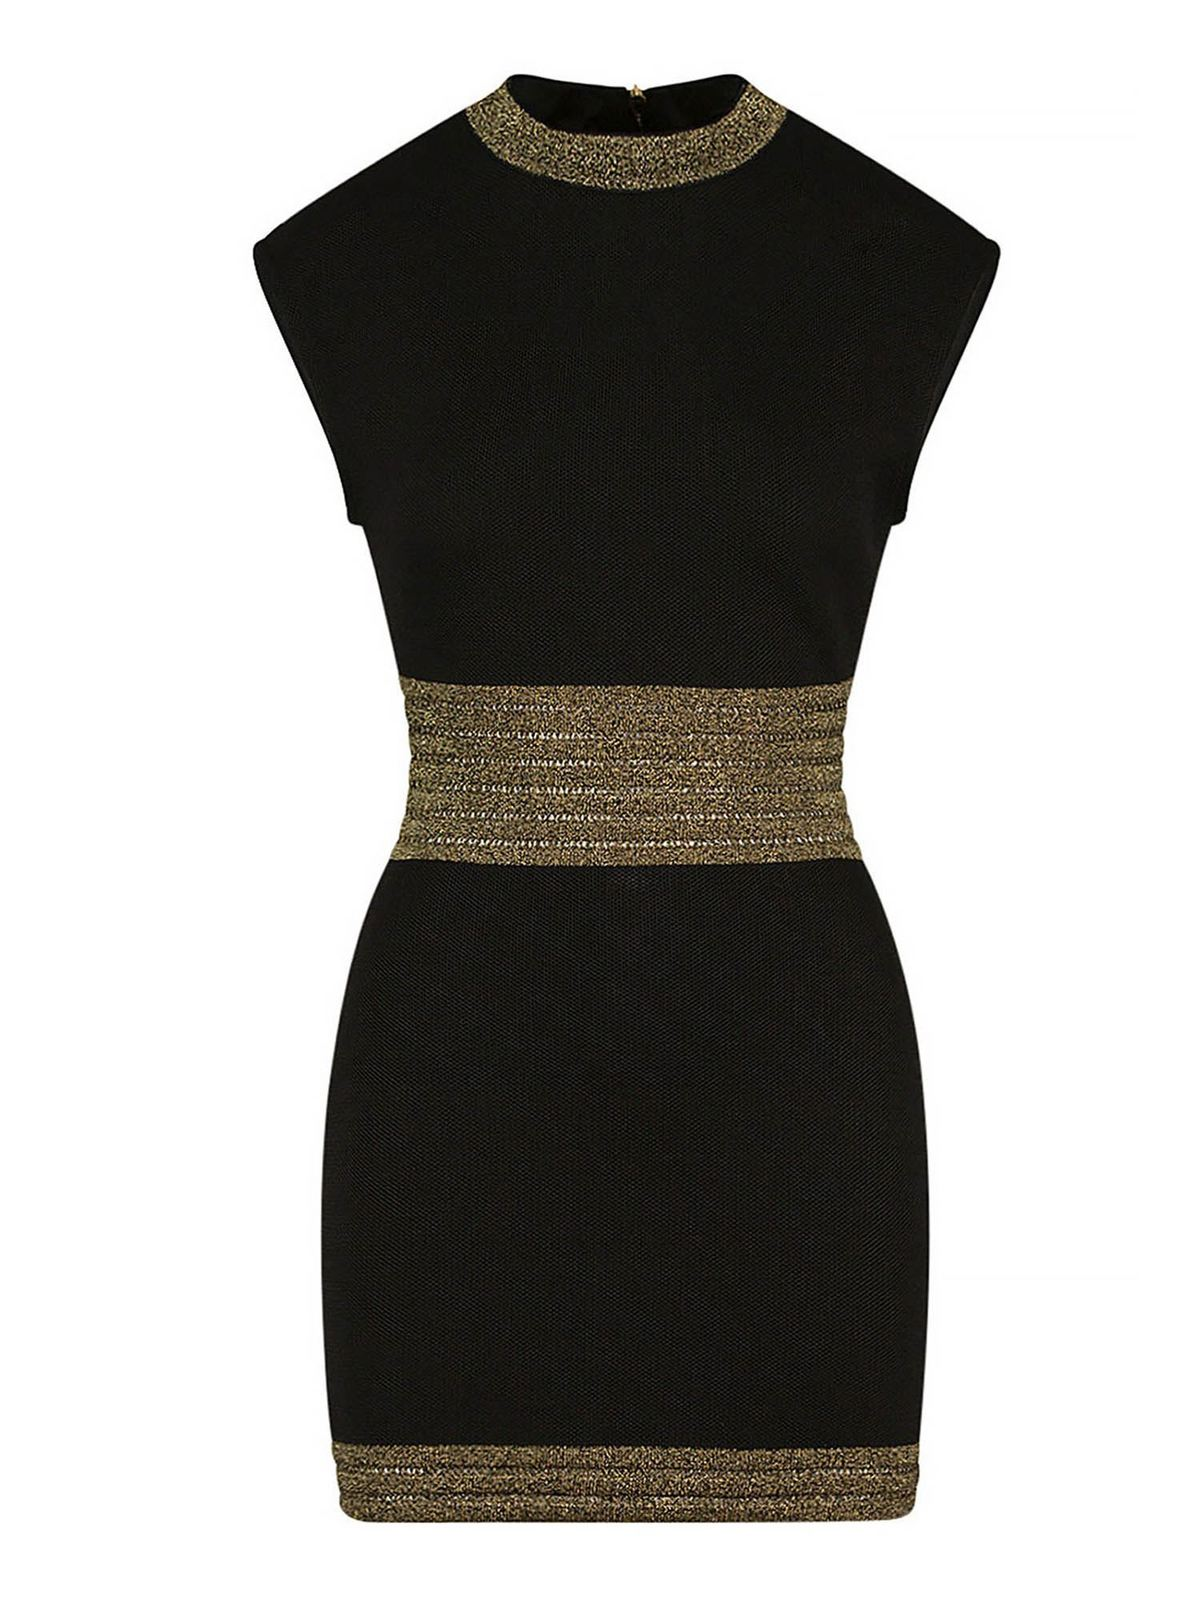 BALMAIN LAME DETAILS SHORT DRESS IN BLACK